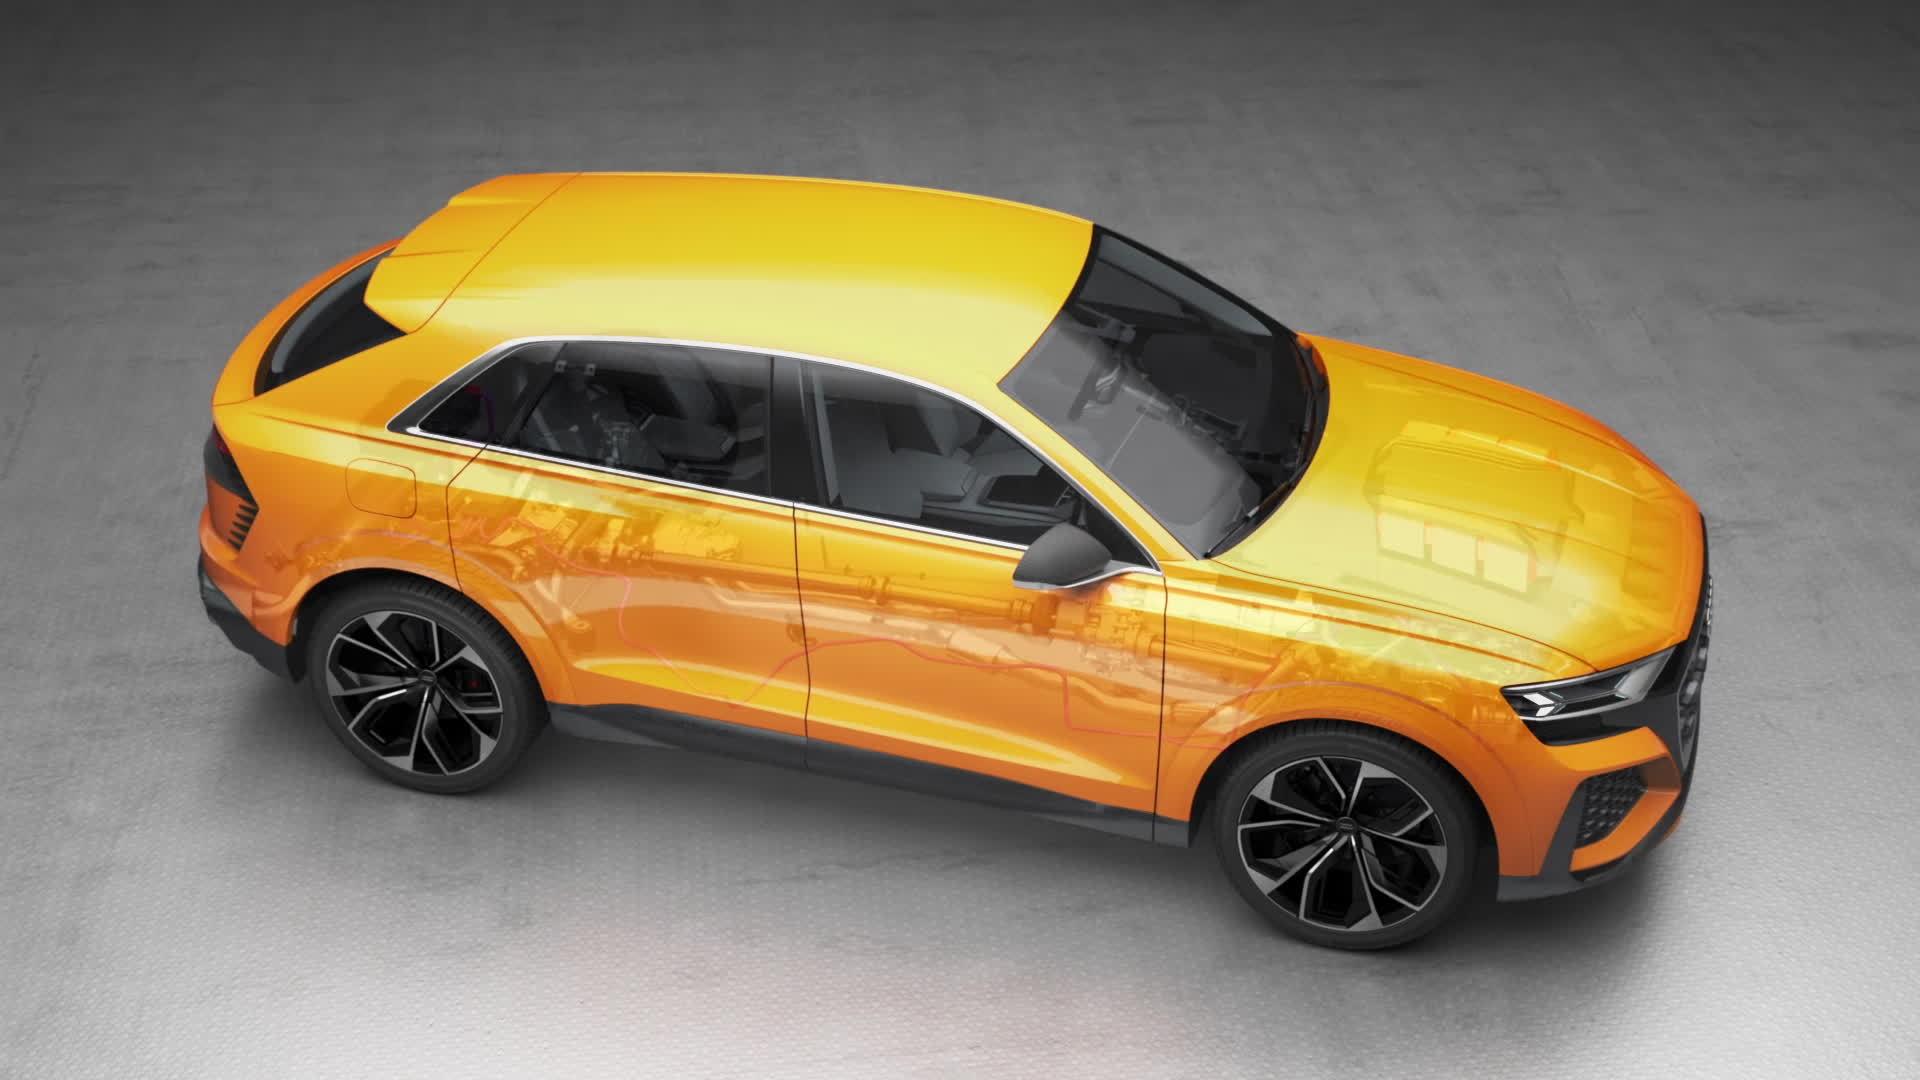 Audi Q8 sport concept - Animation